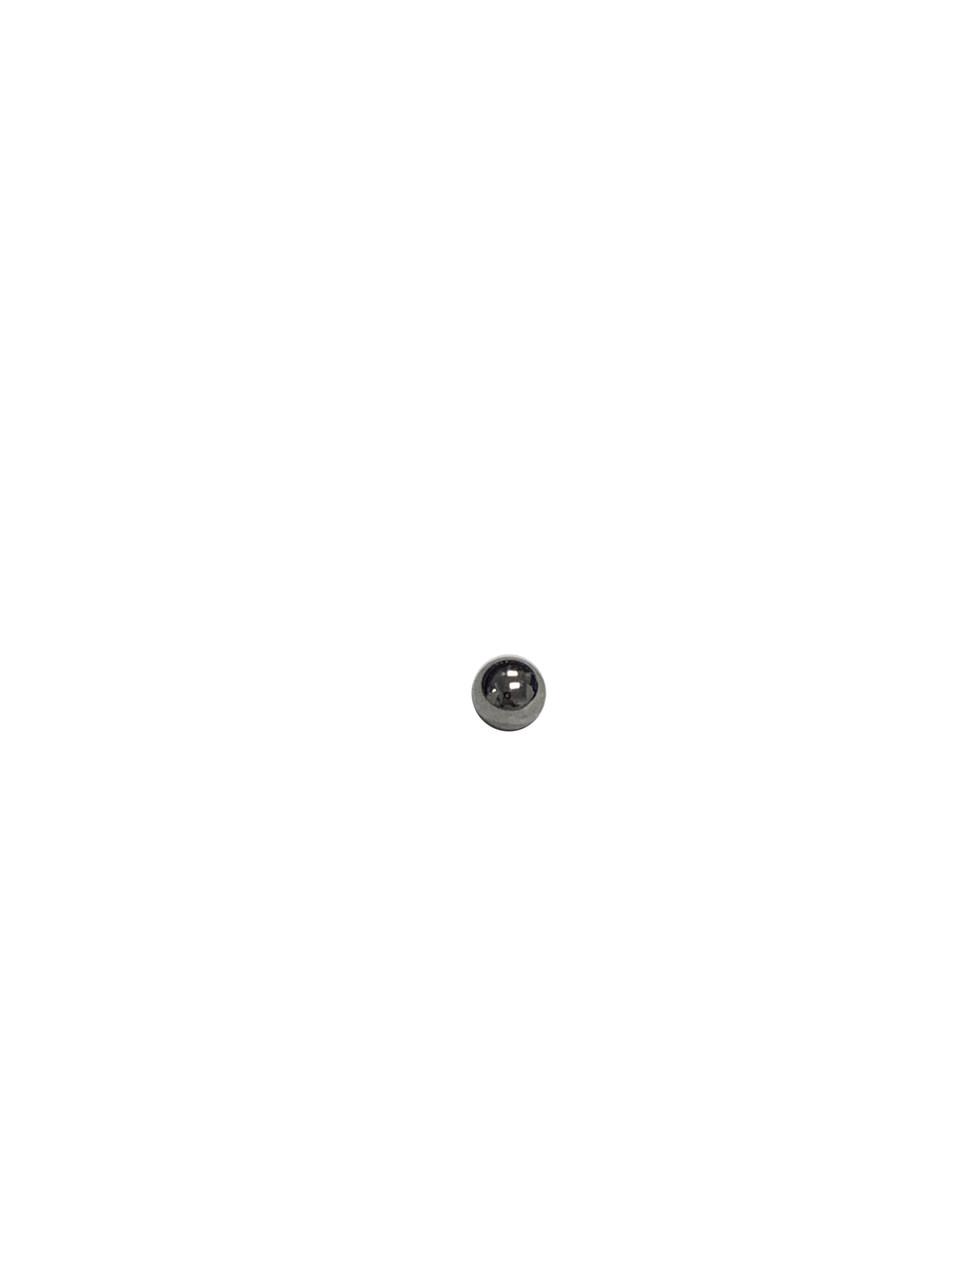 Milwaukee 02-02-0275 Ball 7 mm